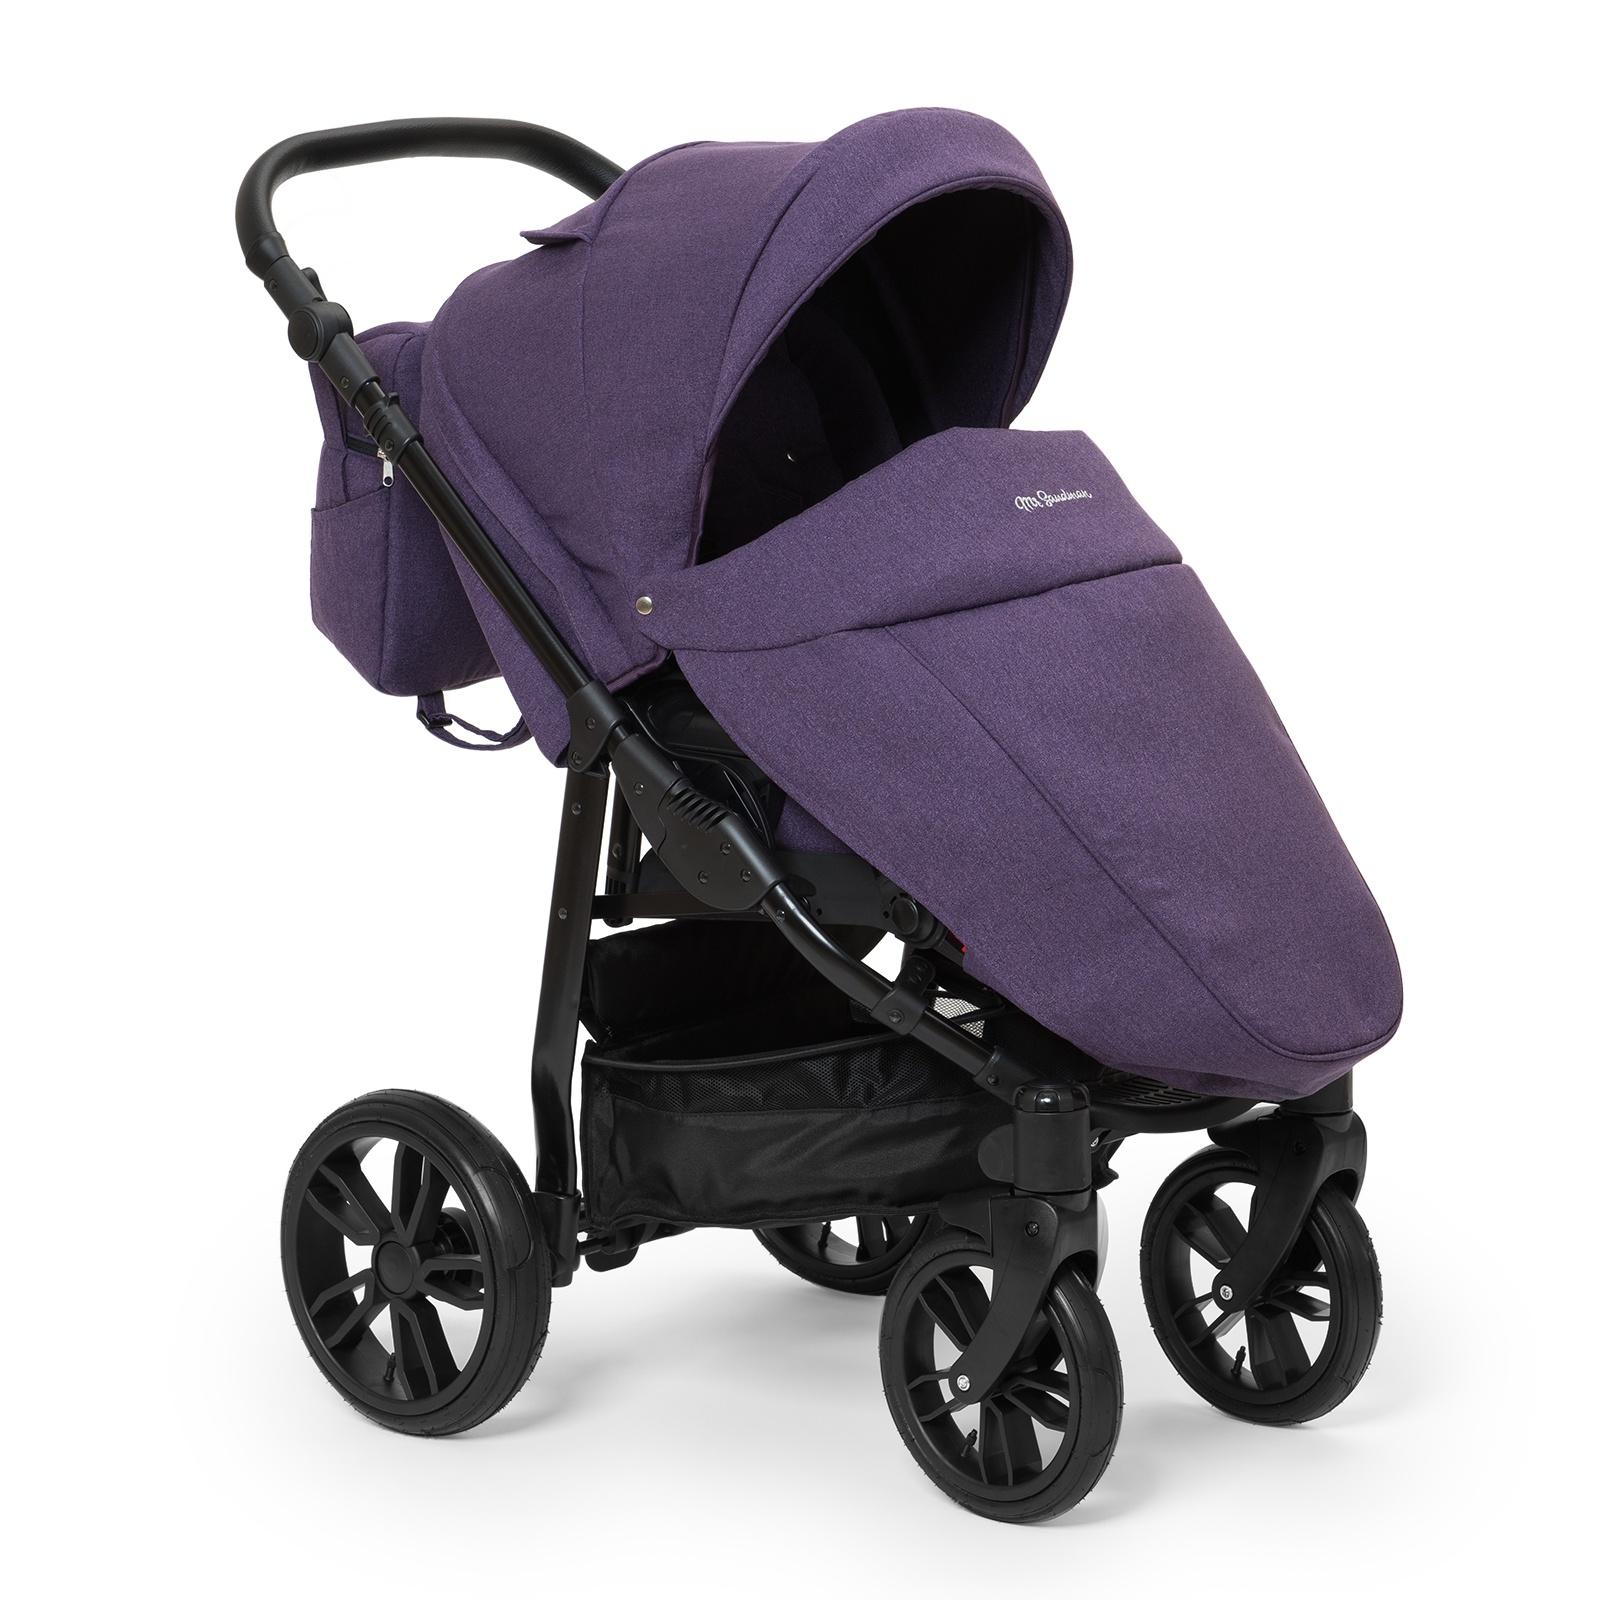 цена на Коляска прогулочная Mr Sandman Vortex, цвет: фиолетовый